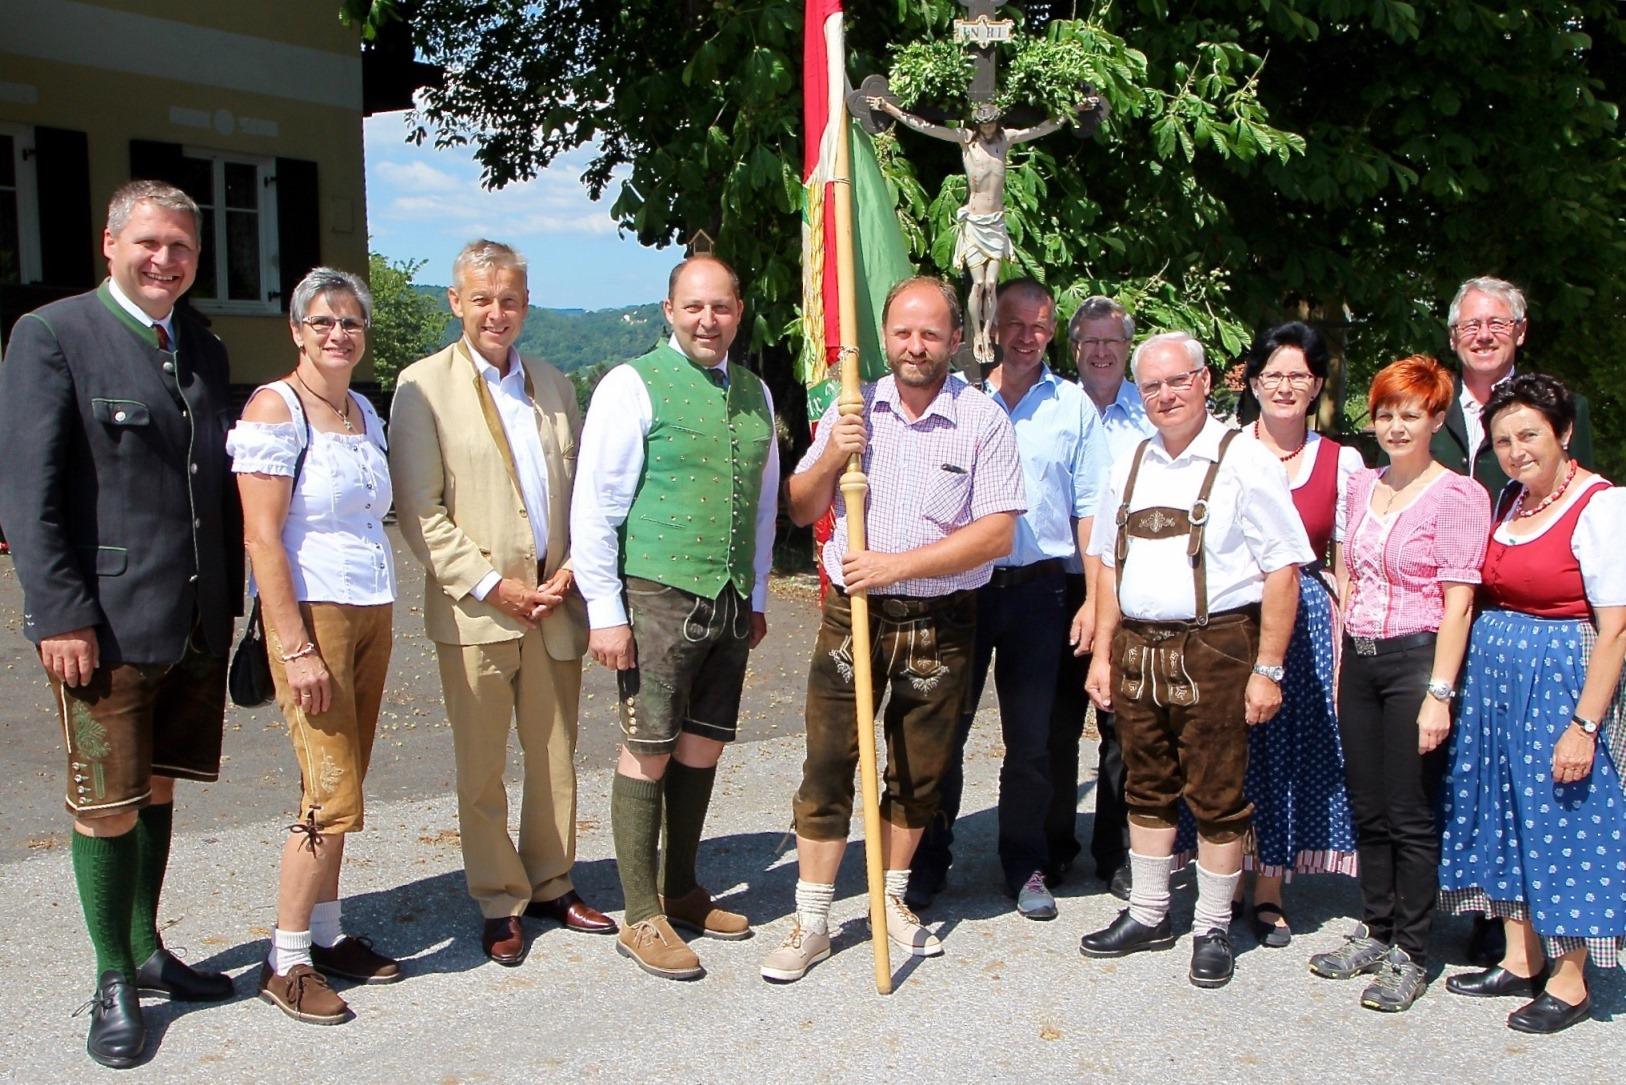 (c) ÖVP Hartberg-Fürstenfeld